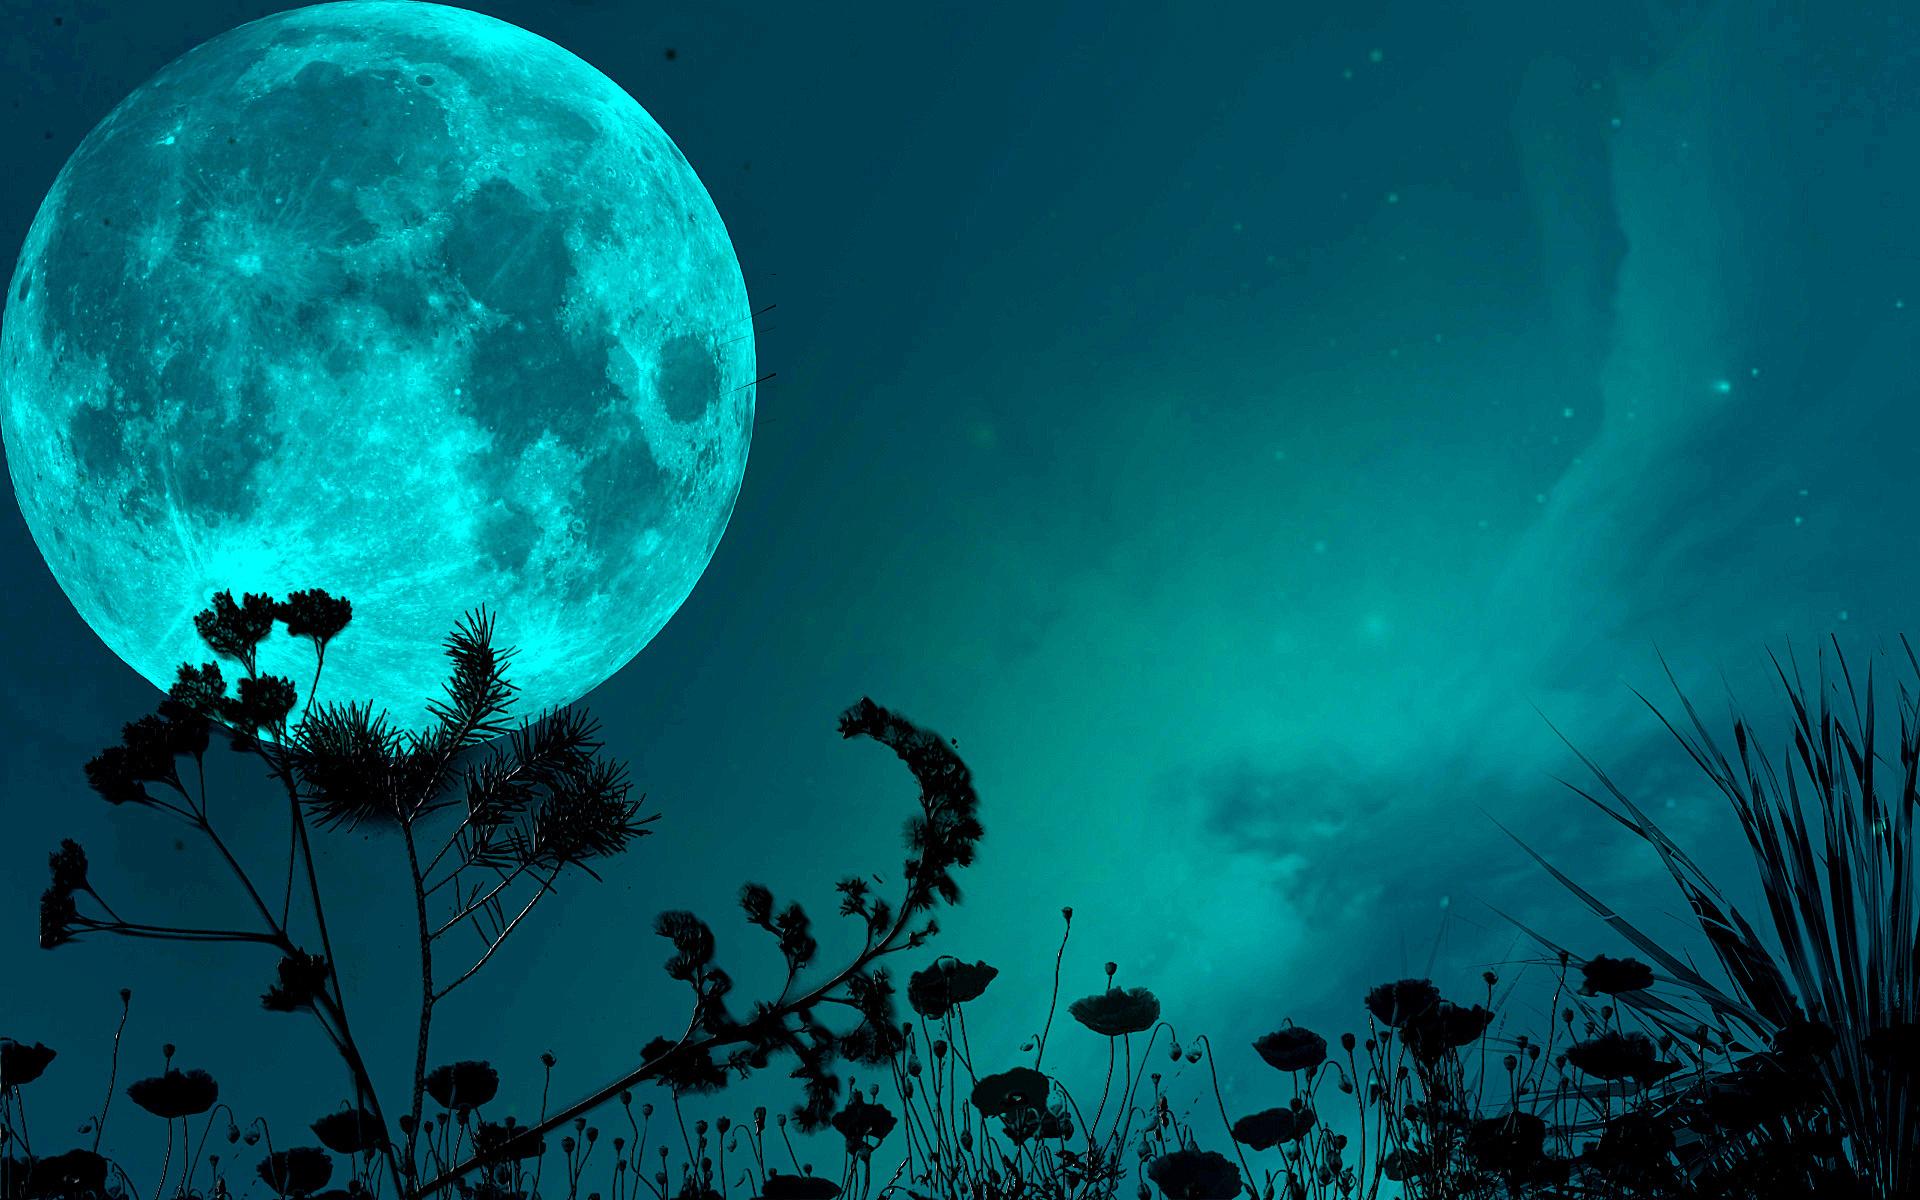 Night Sky Moon Shadows Grass Blade Stars Wallpaper 1920x1200